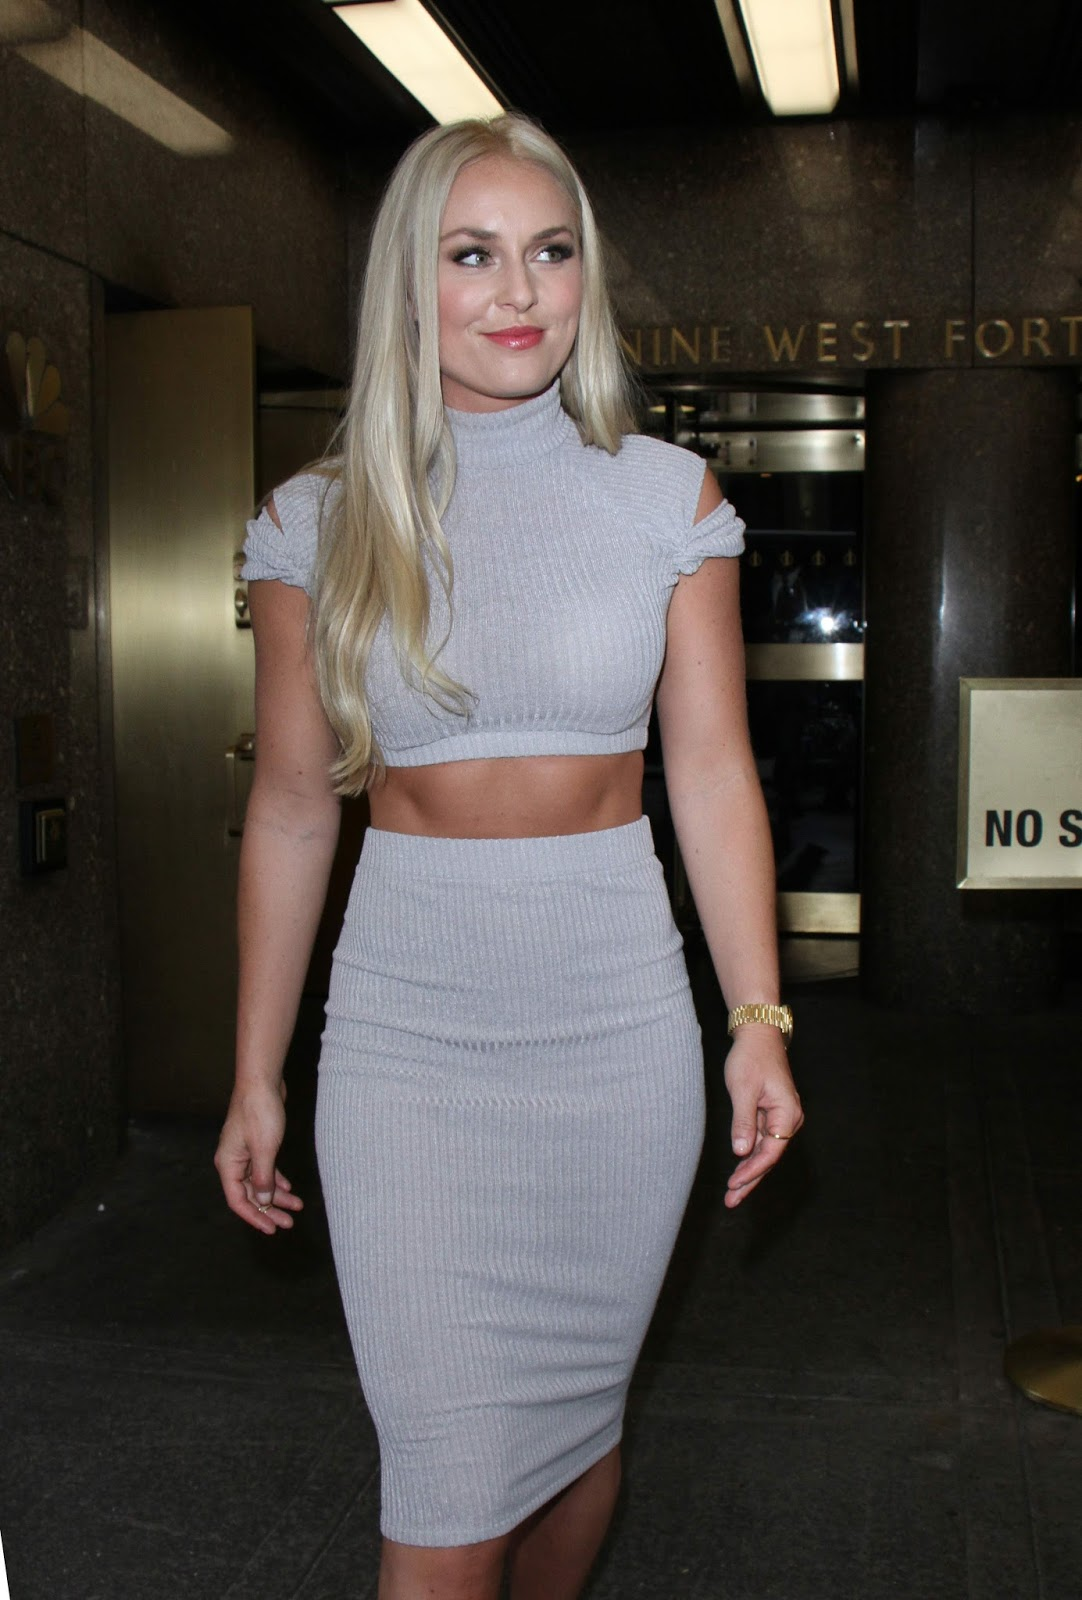 Lindsey Vonn in Tight Dress